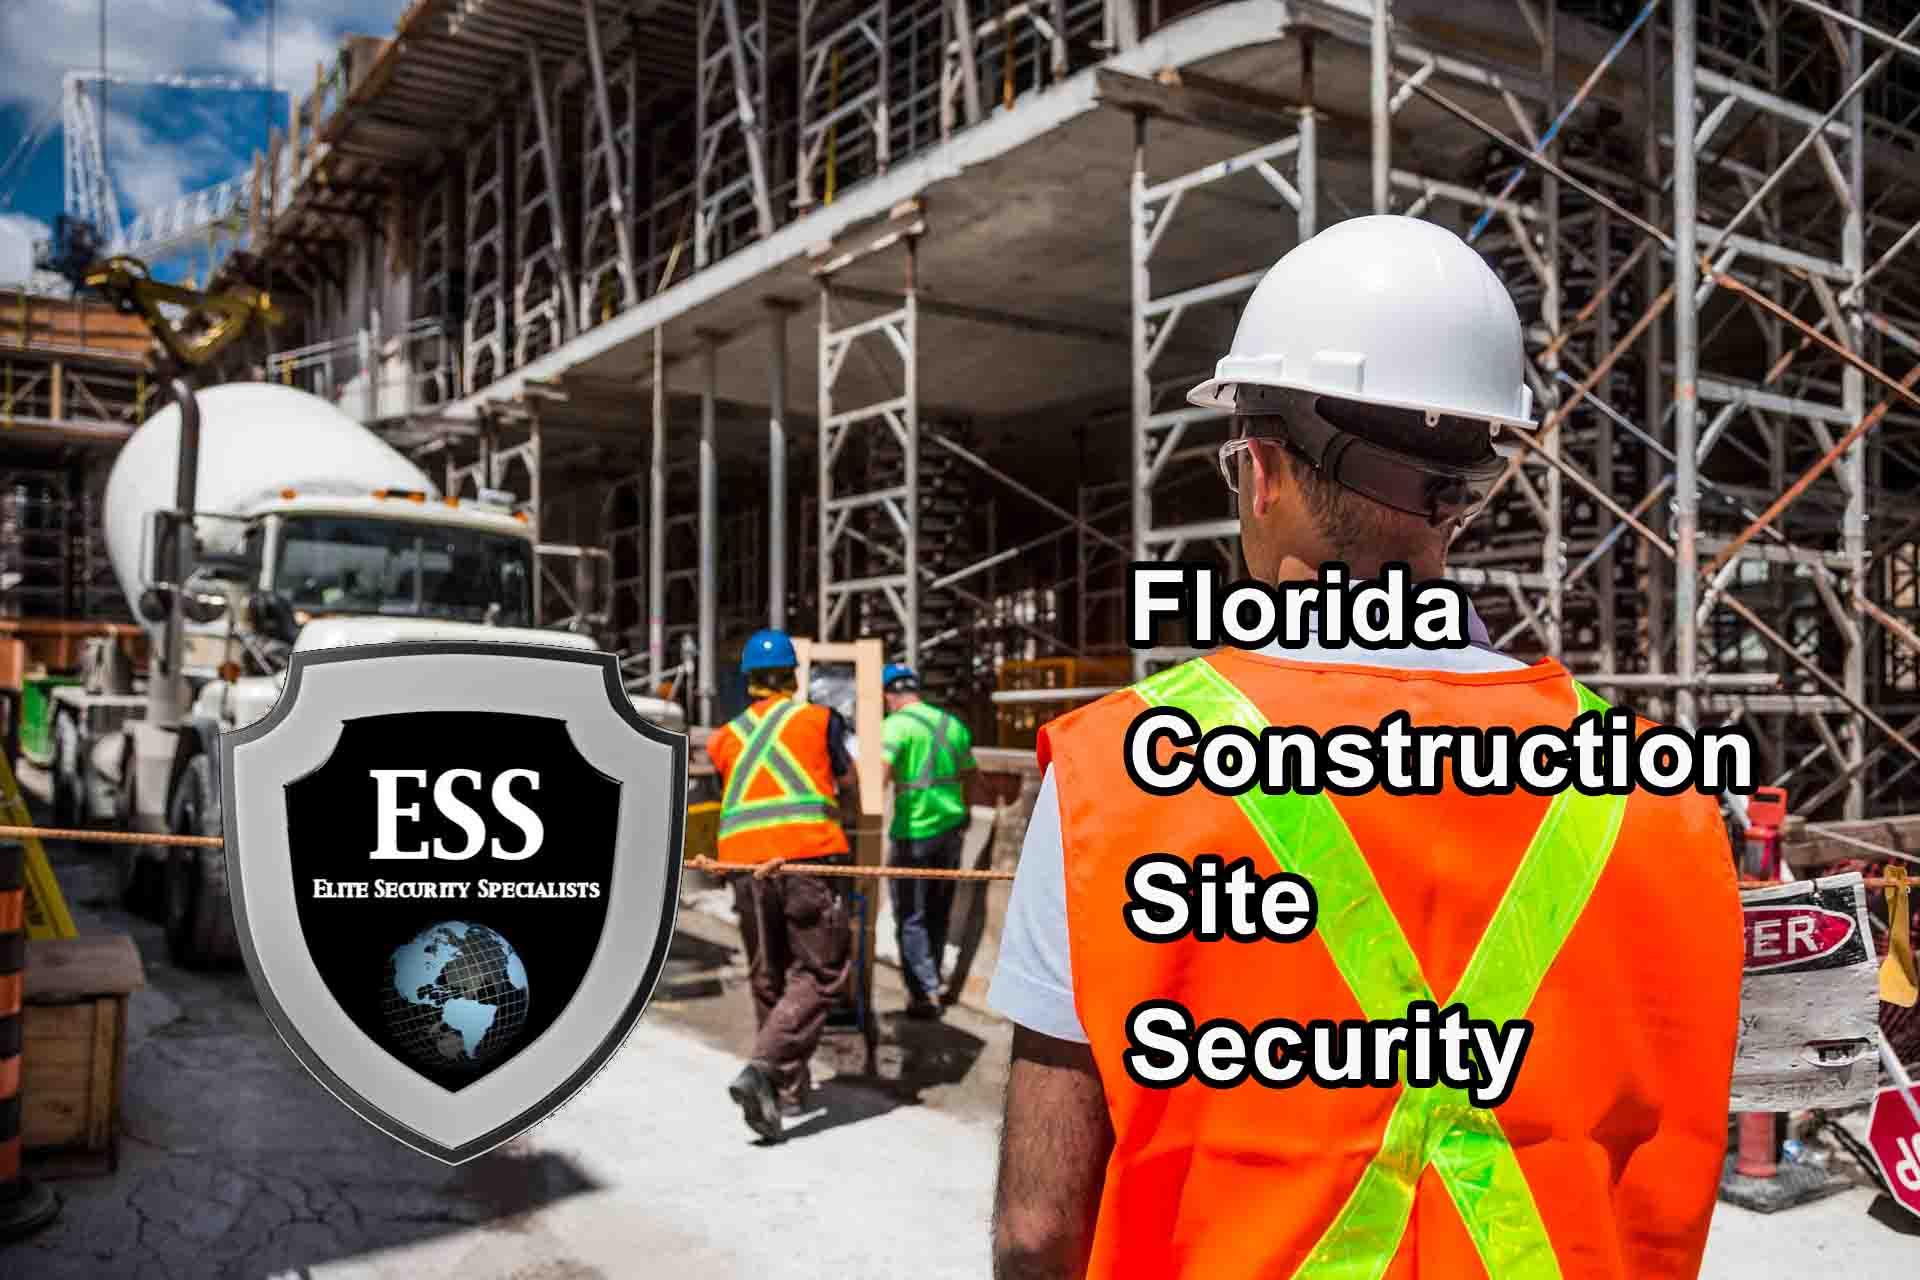 Florida Construction Site Security 2